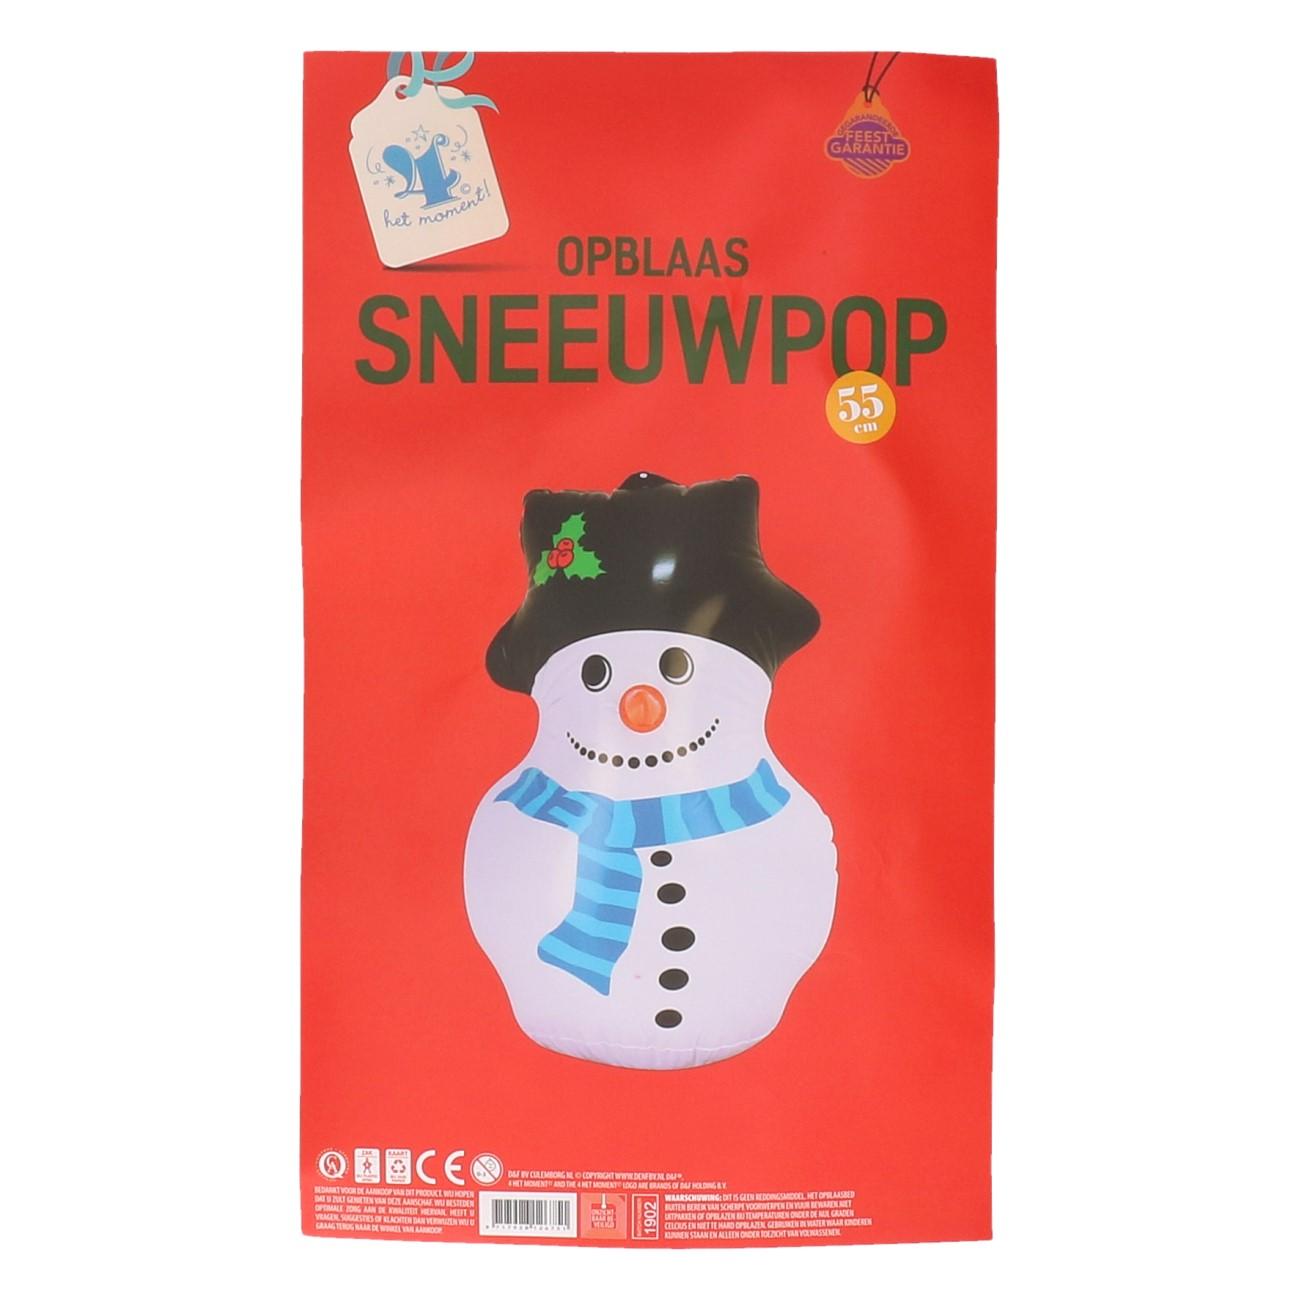 Opblaas Sneeuwpop